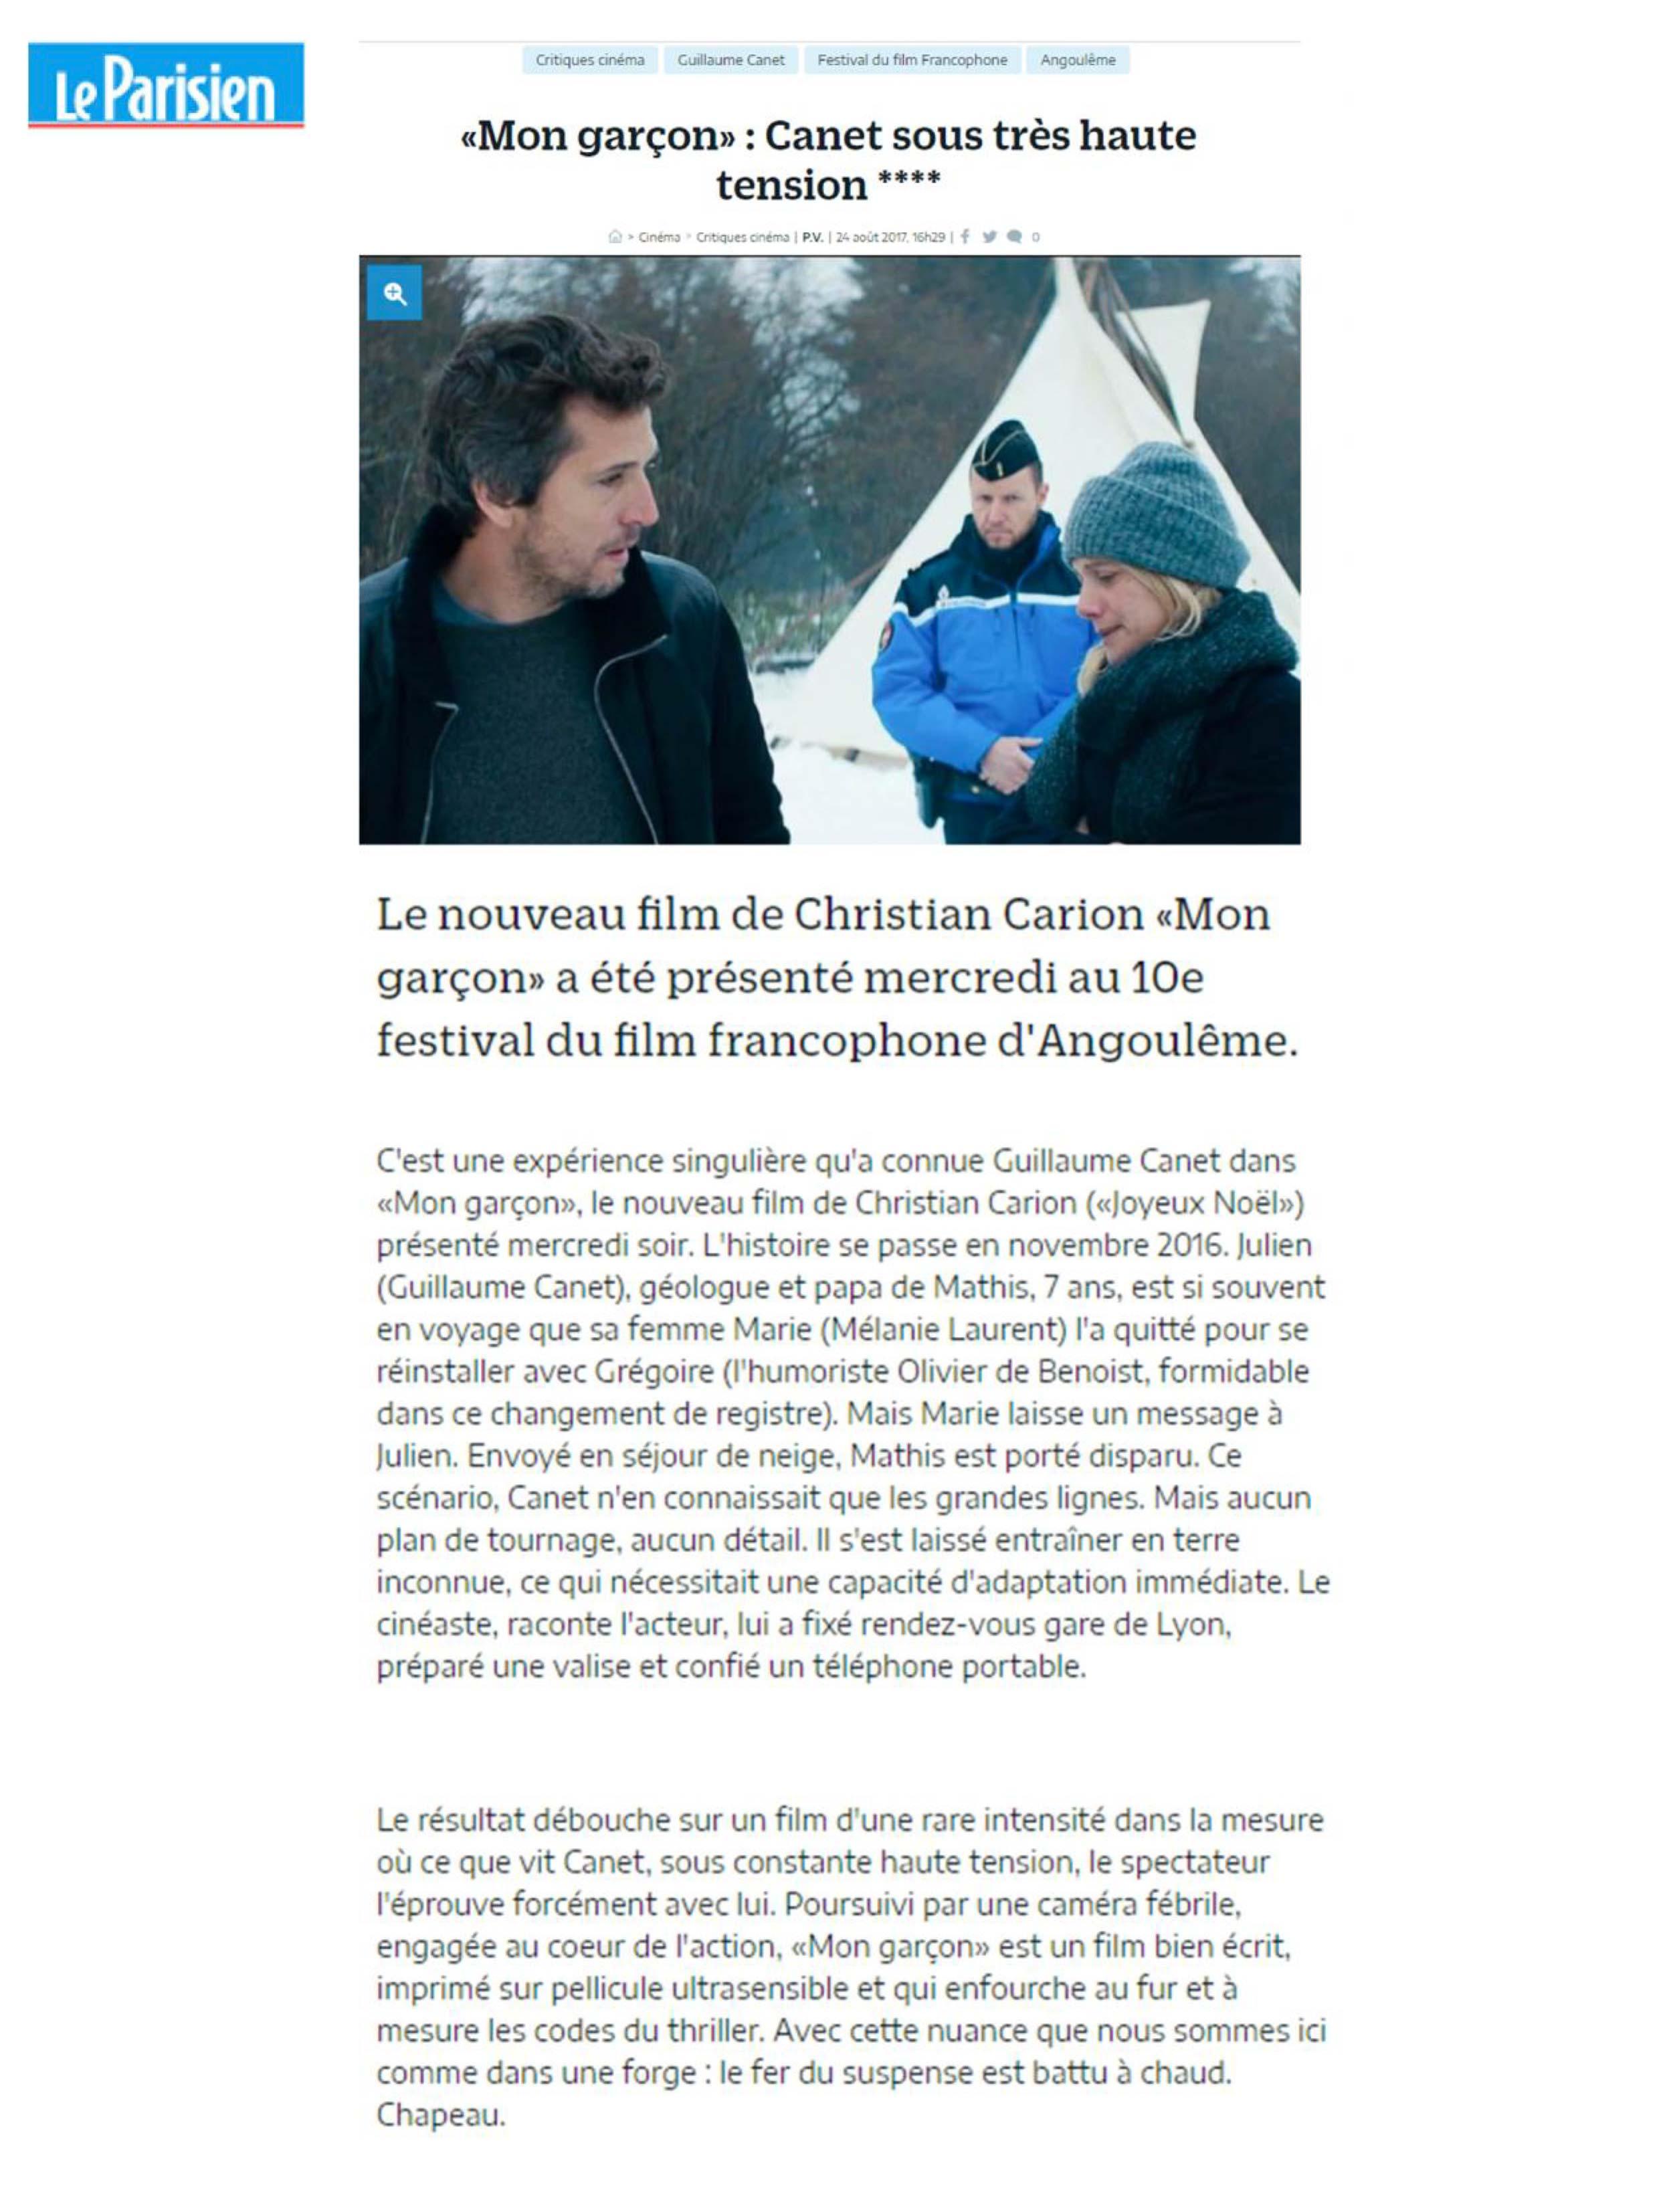 MonGarcon_LeParisien-1